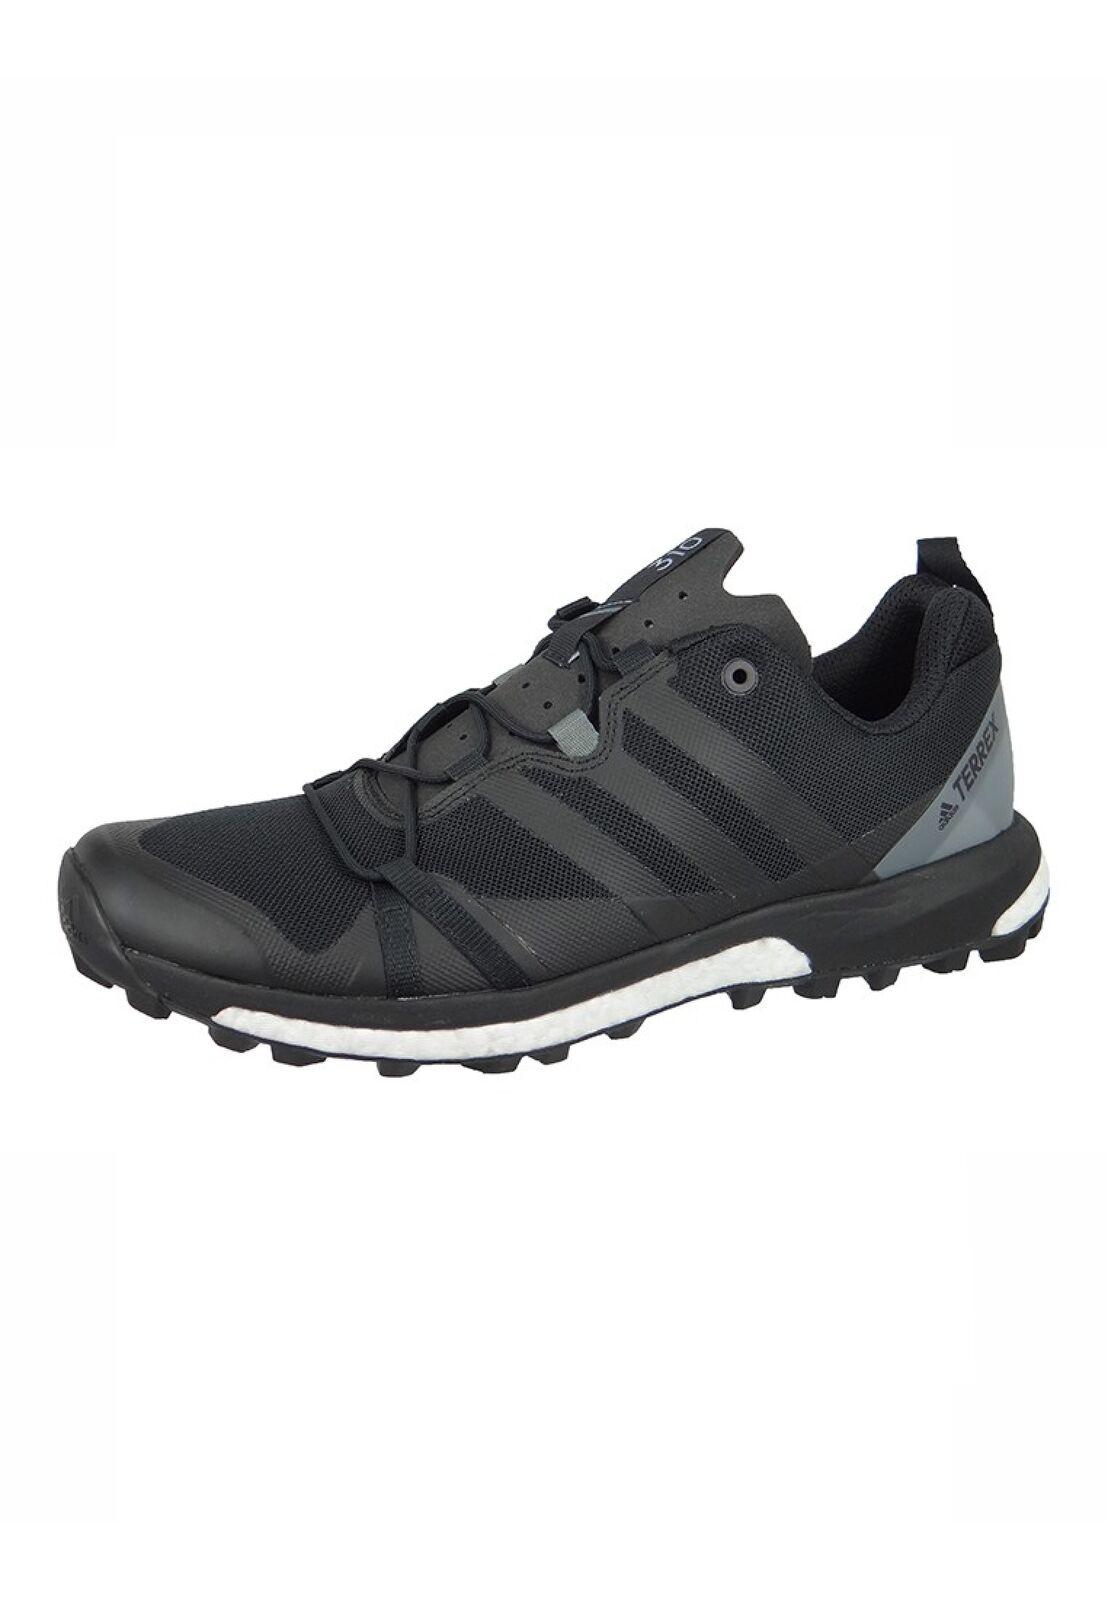 Adidas hommes Outdoor Terrex AGRAVIC noir-bb0960 Taille 41 - 46